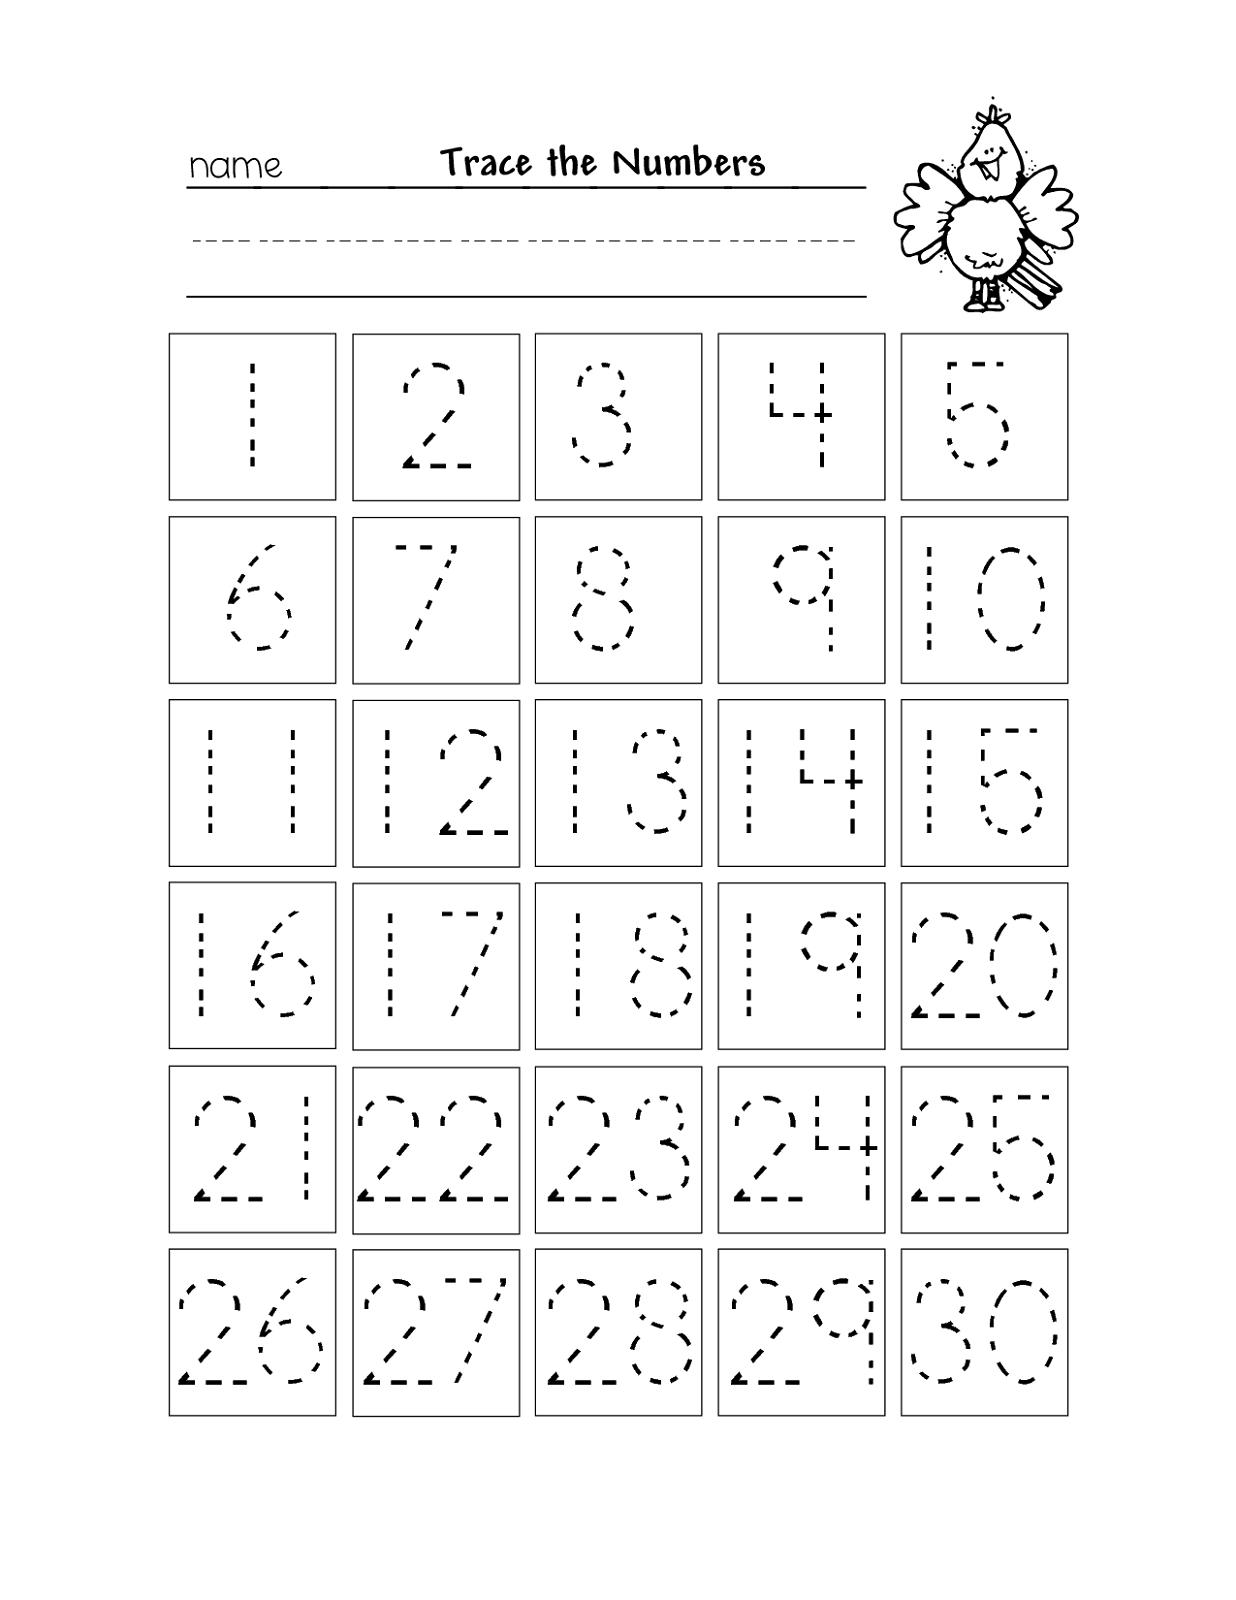 Trace The Numbers 1-30 | Kiddo Shelter | Kids Worksheets Printable | Printable Number Tracing Worksheets For Kindergarten